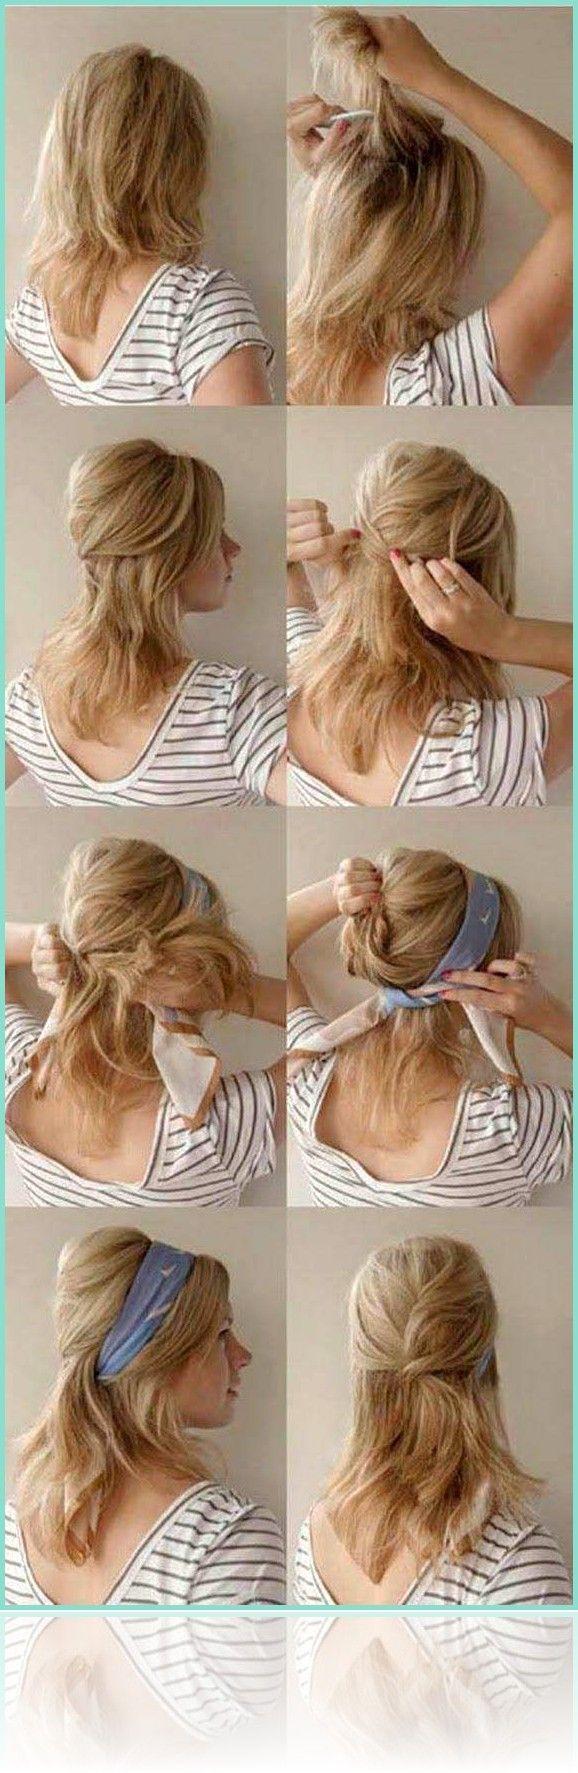 lange Haarmodelle – bandana binden anleitung frisu…